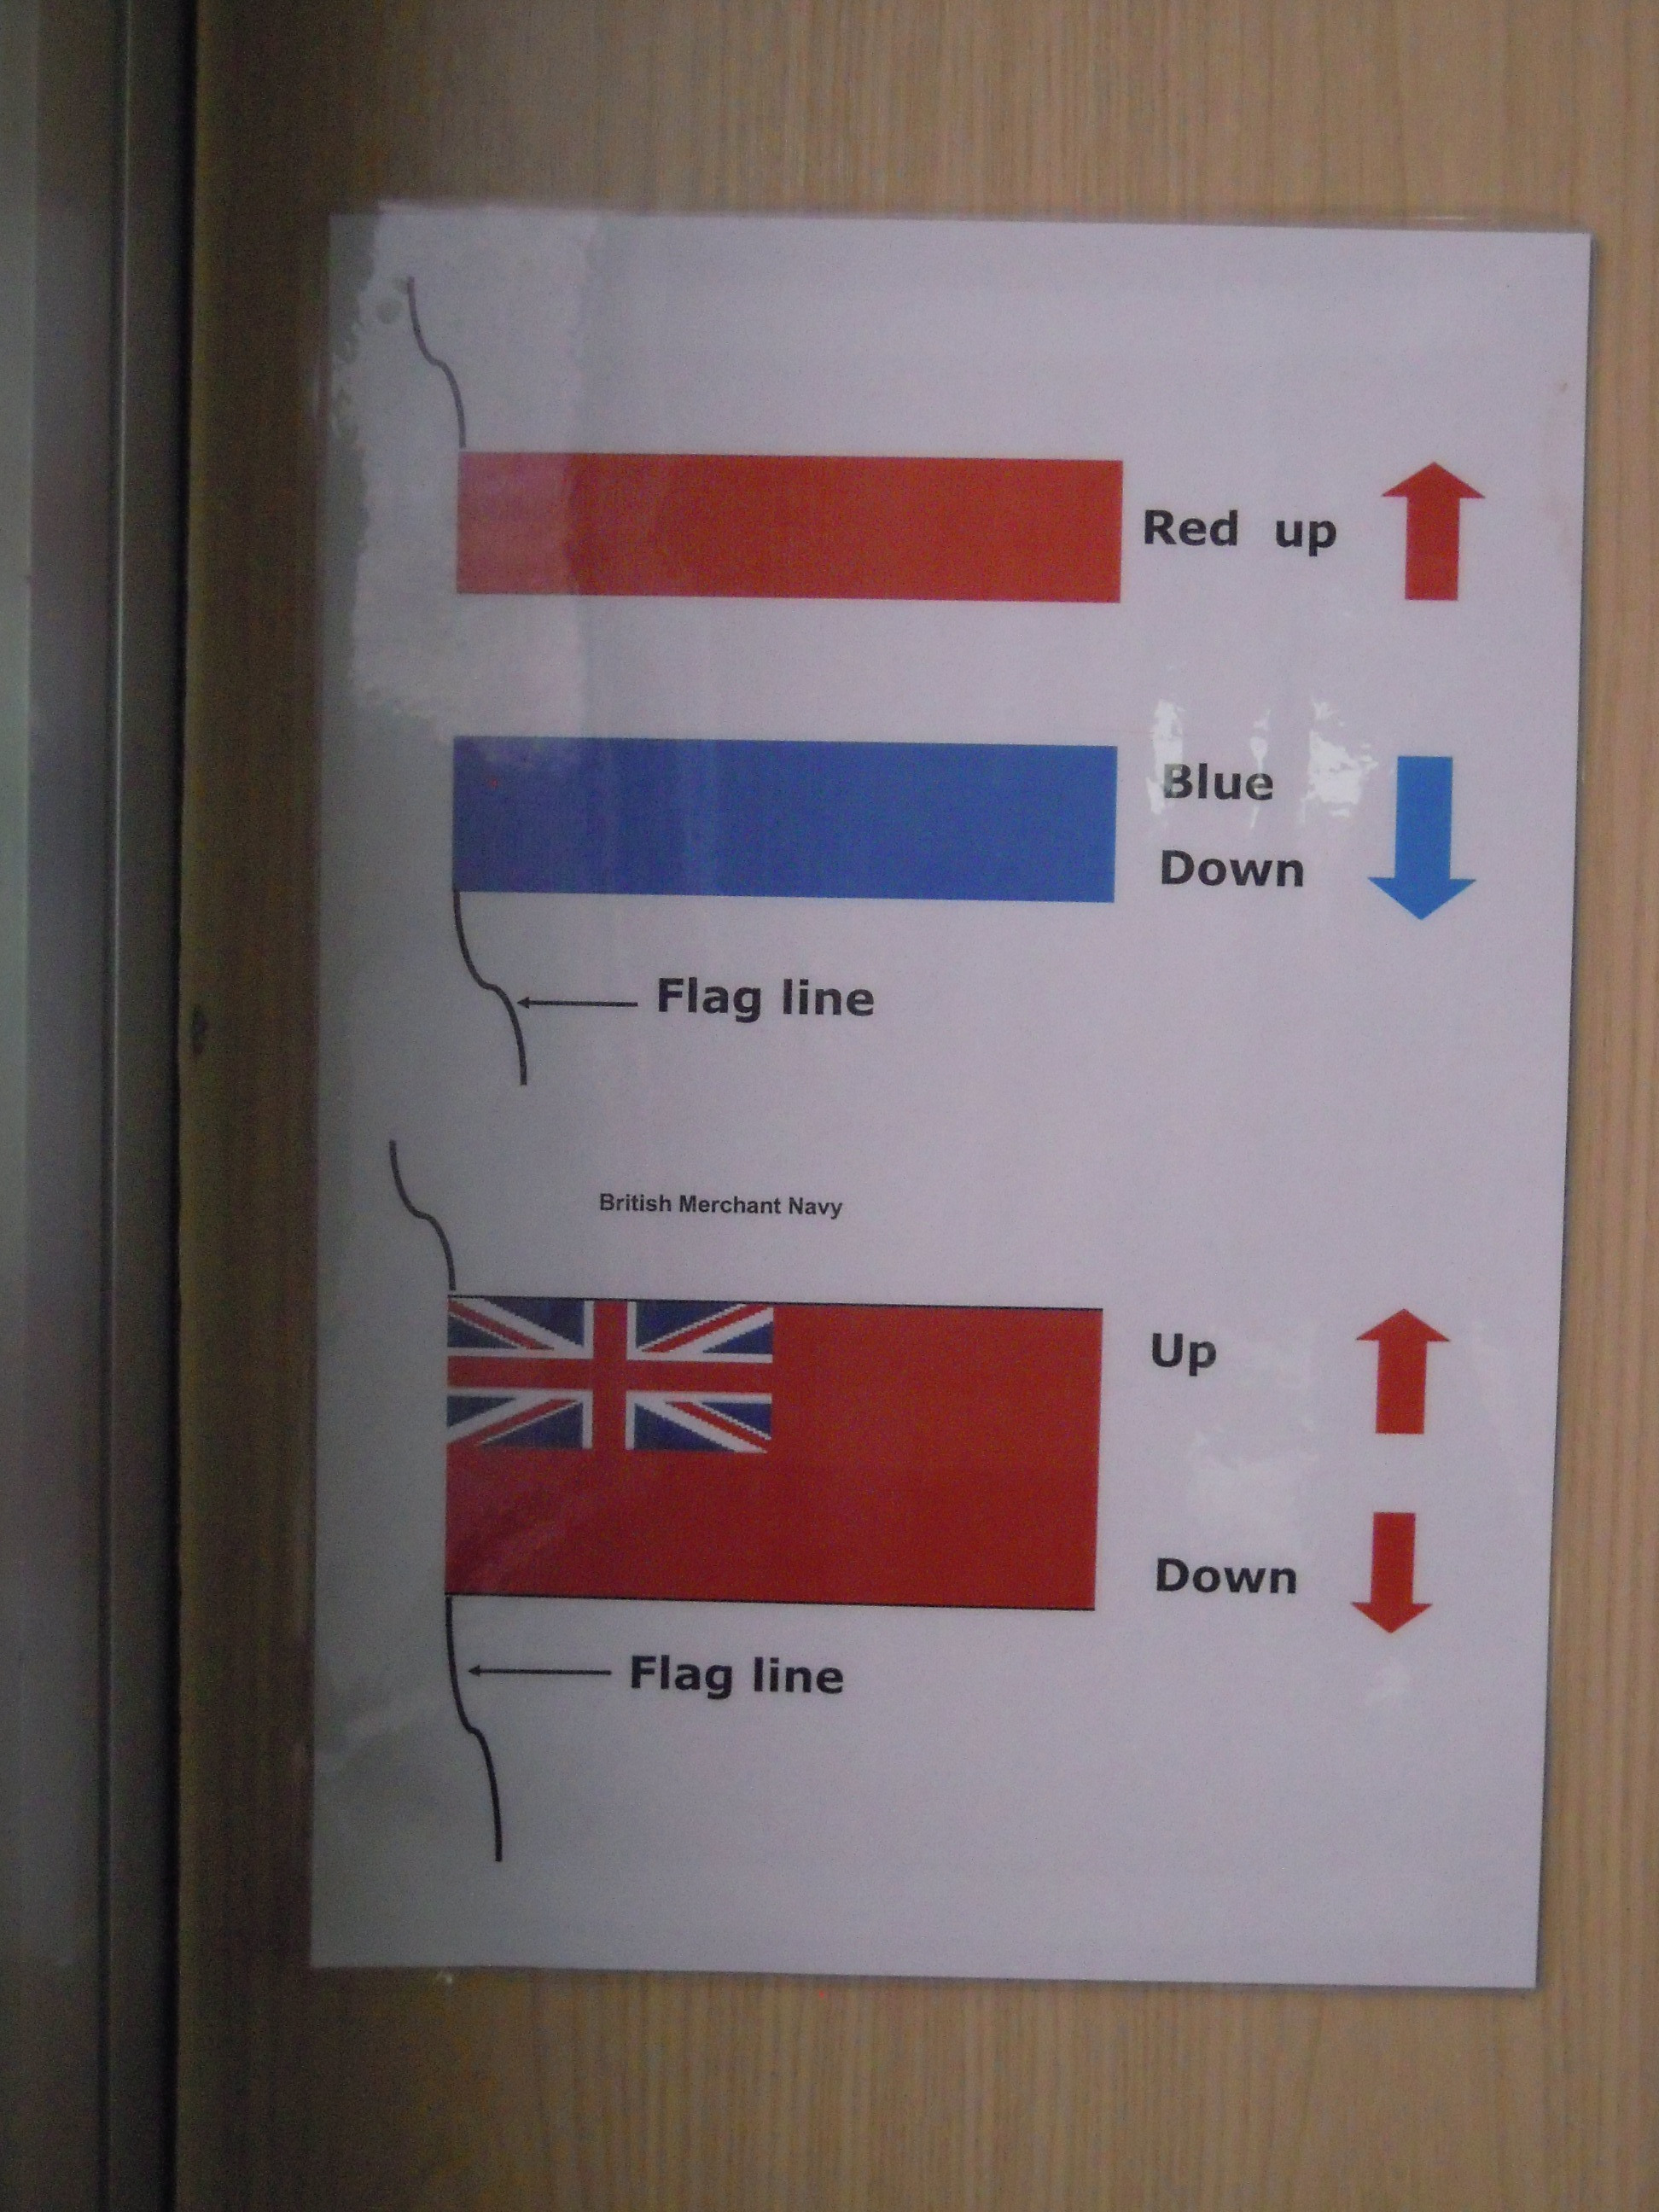 07_vlaggen NL-UK